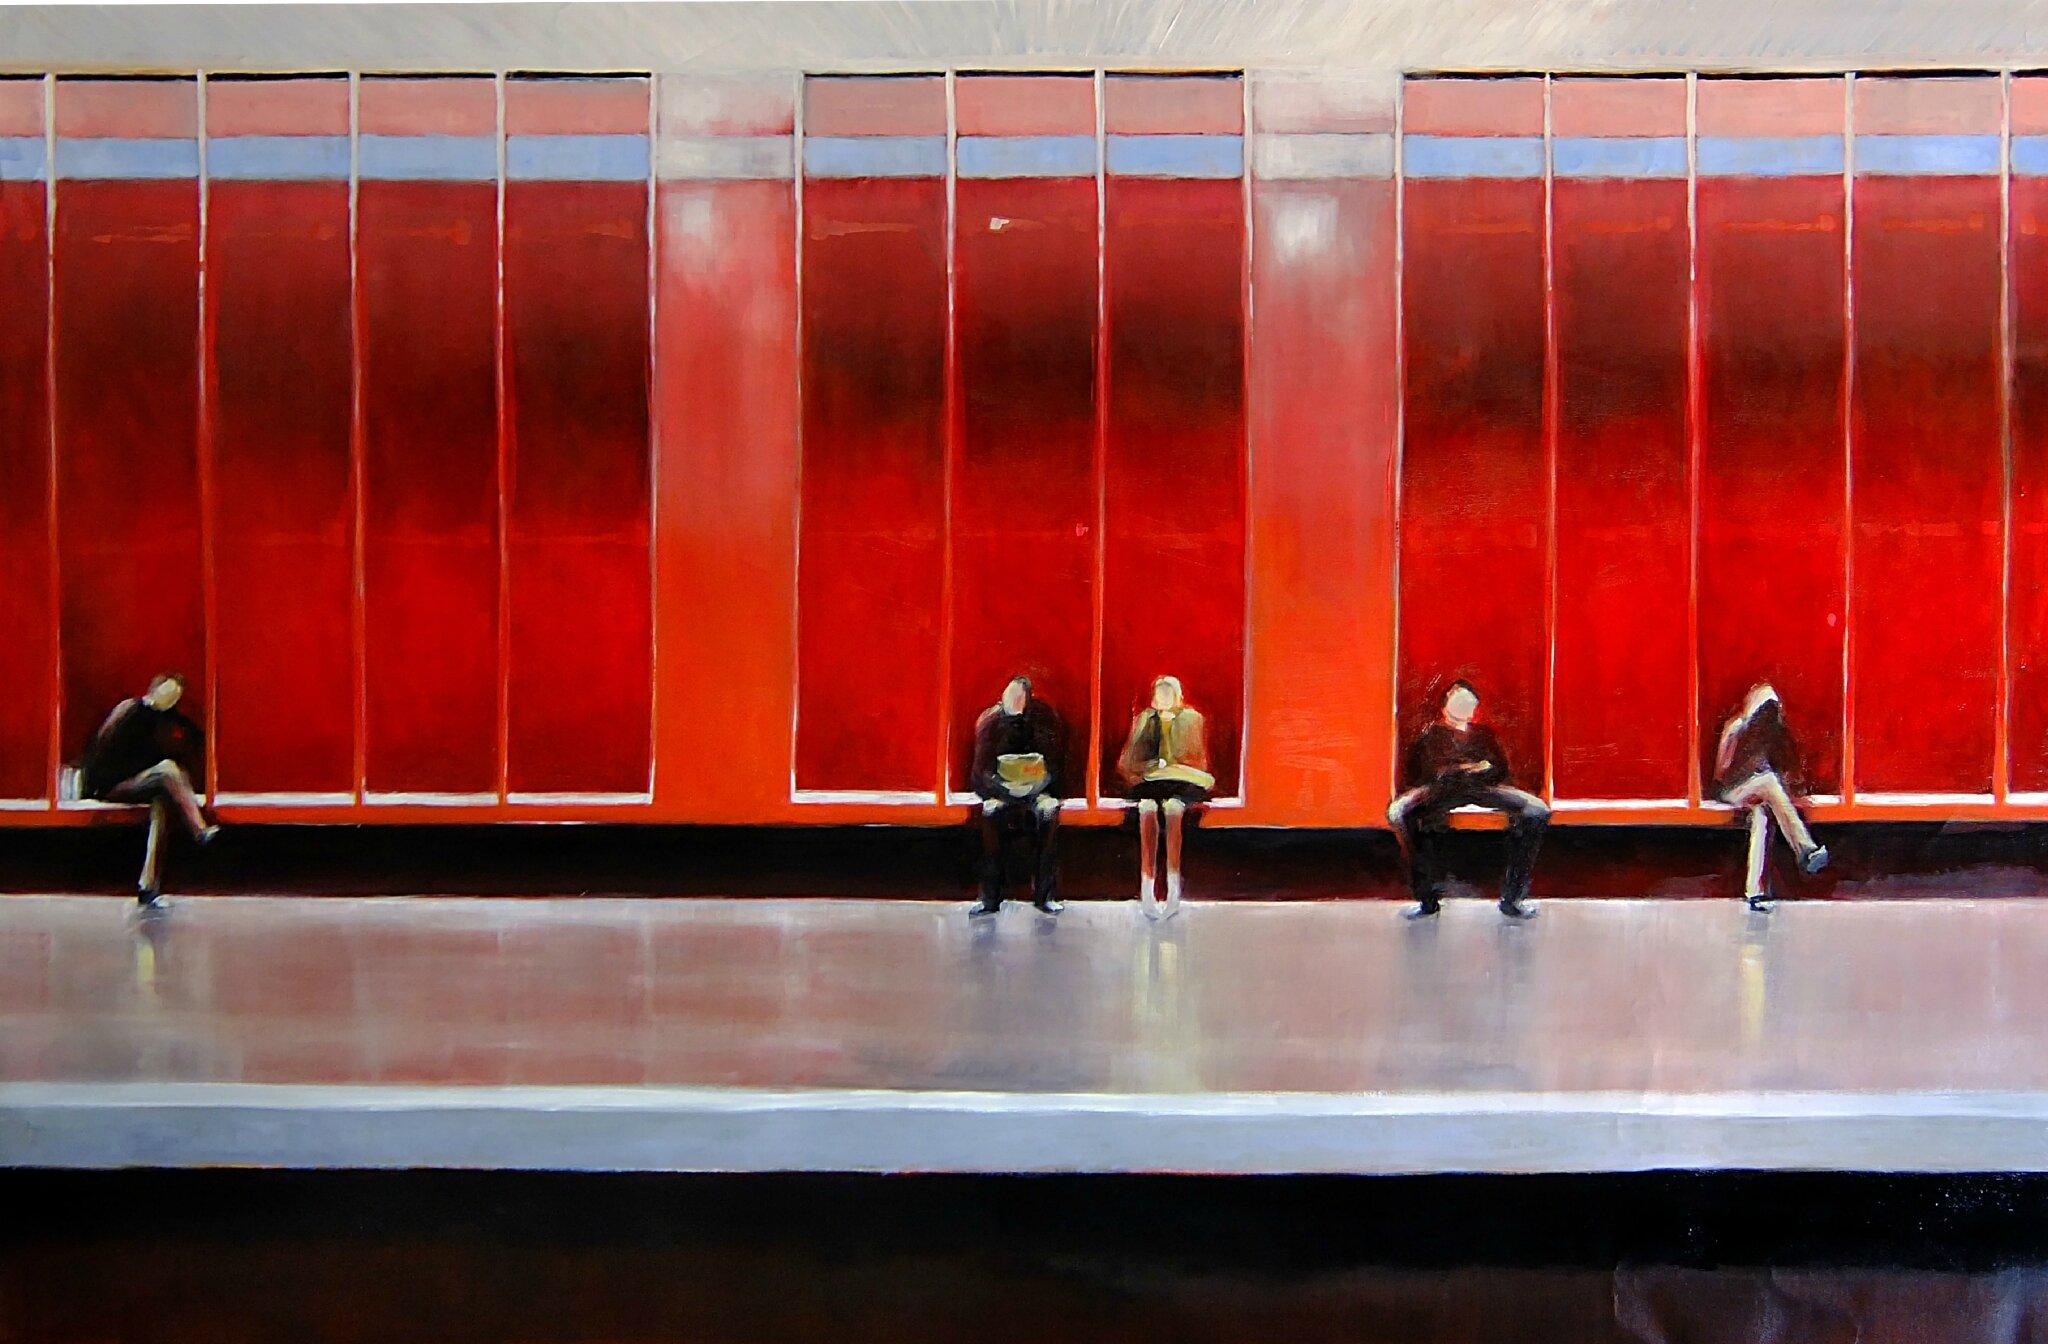 K'nowhere 64, station nation, mars 2016, huile sur toile, 155 x 108 cm